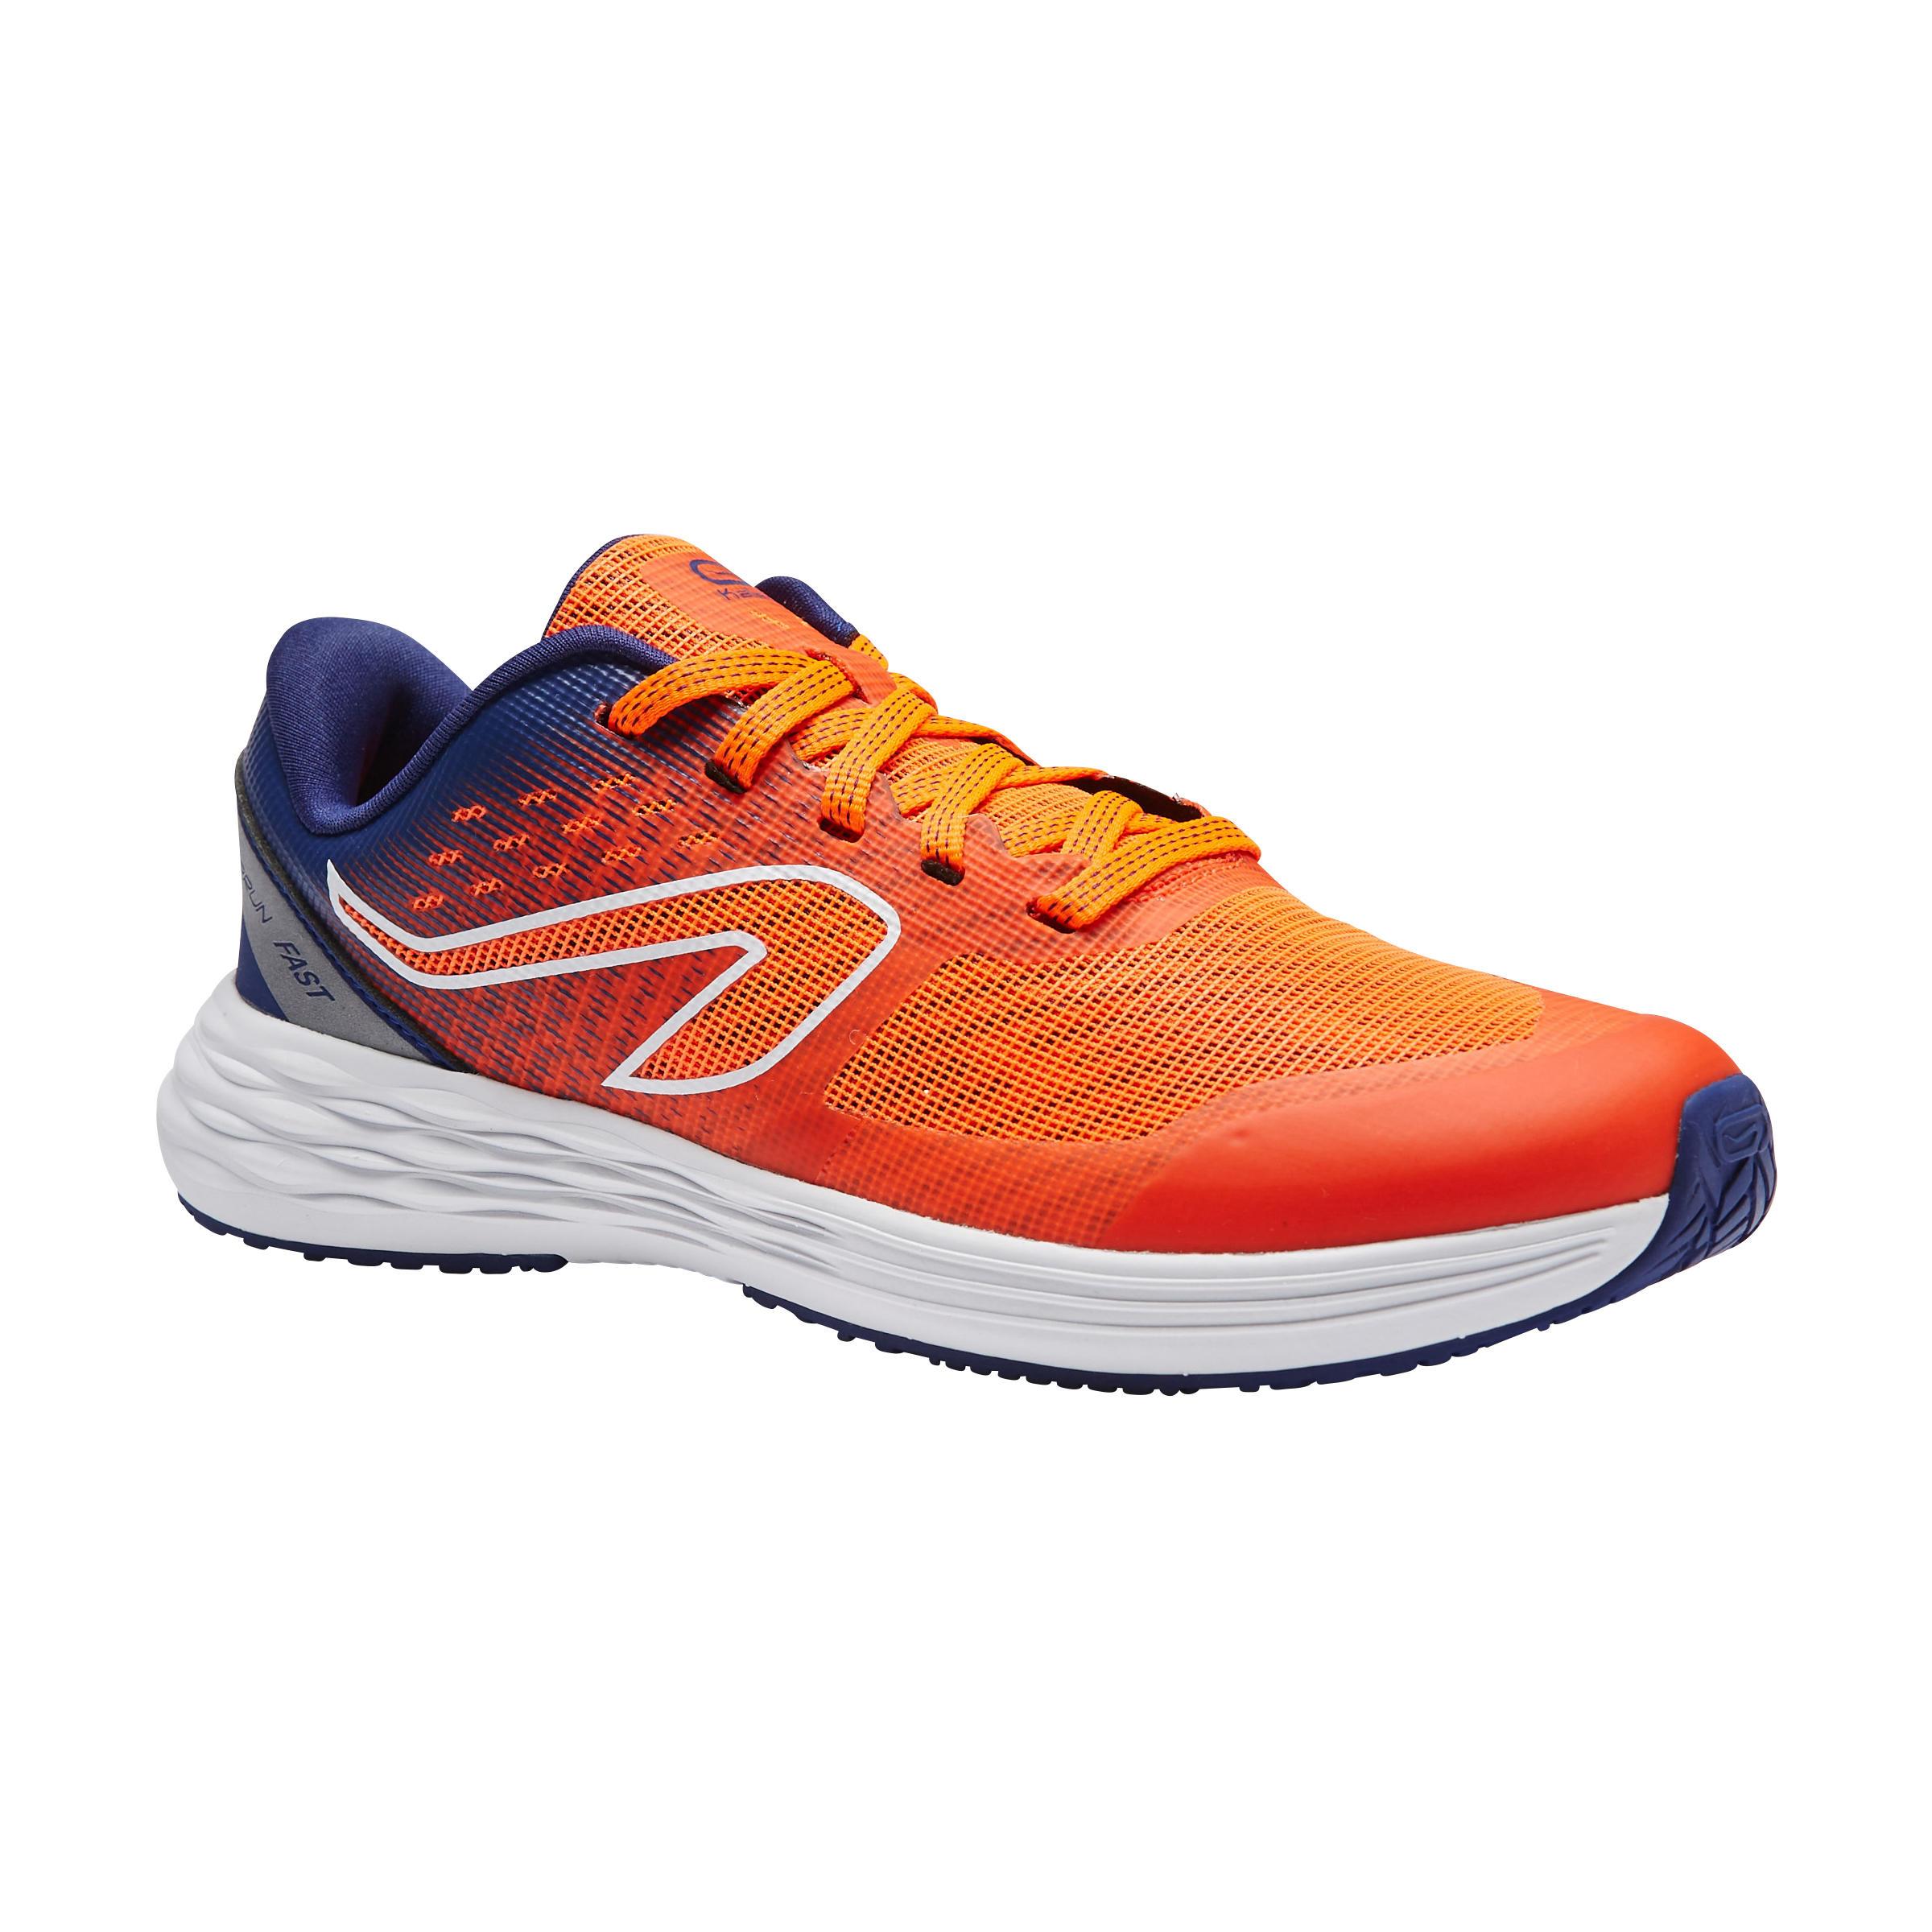 Jungen,Kinder,Kinder Laufschuhe Leichtathletik Kiprun Kinder rot blau | 03608429777342